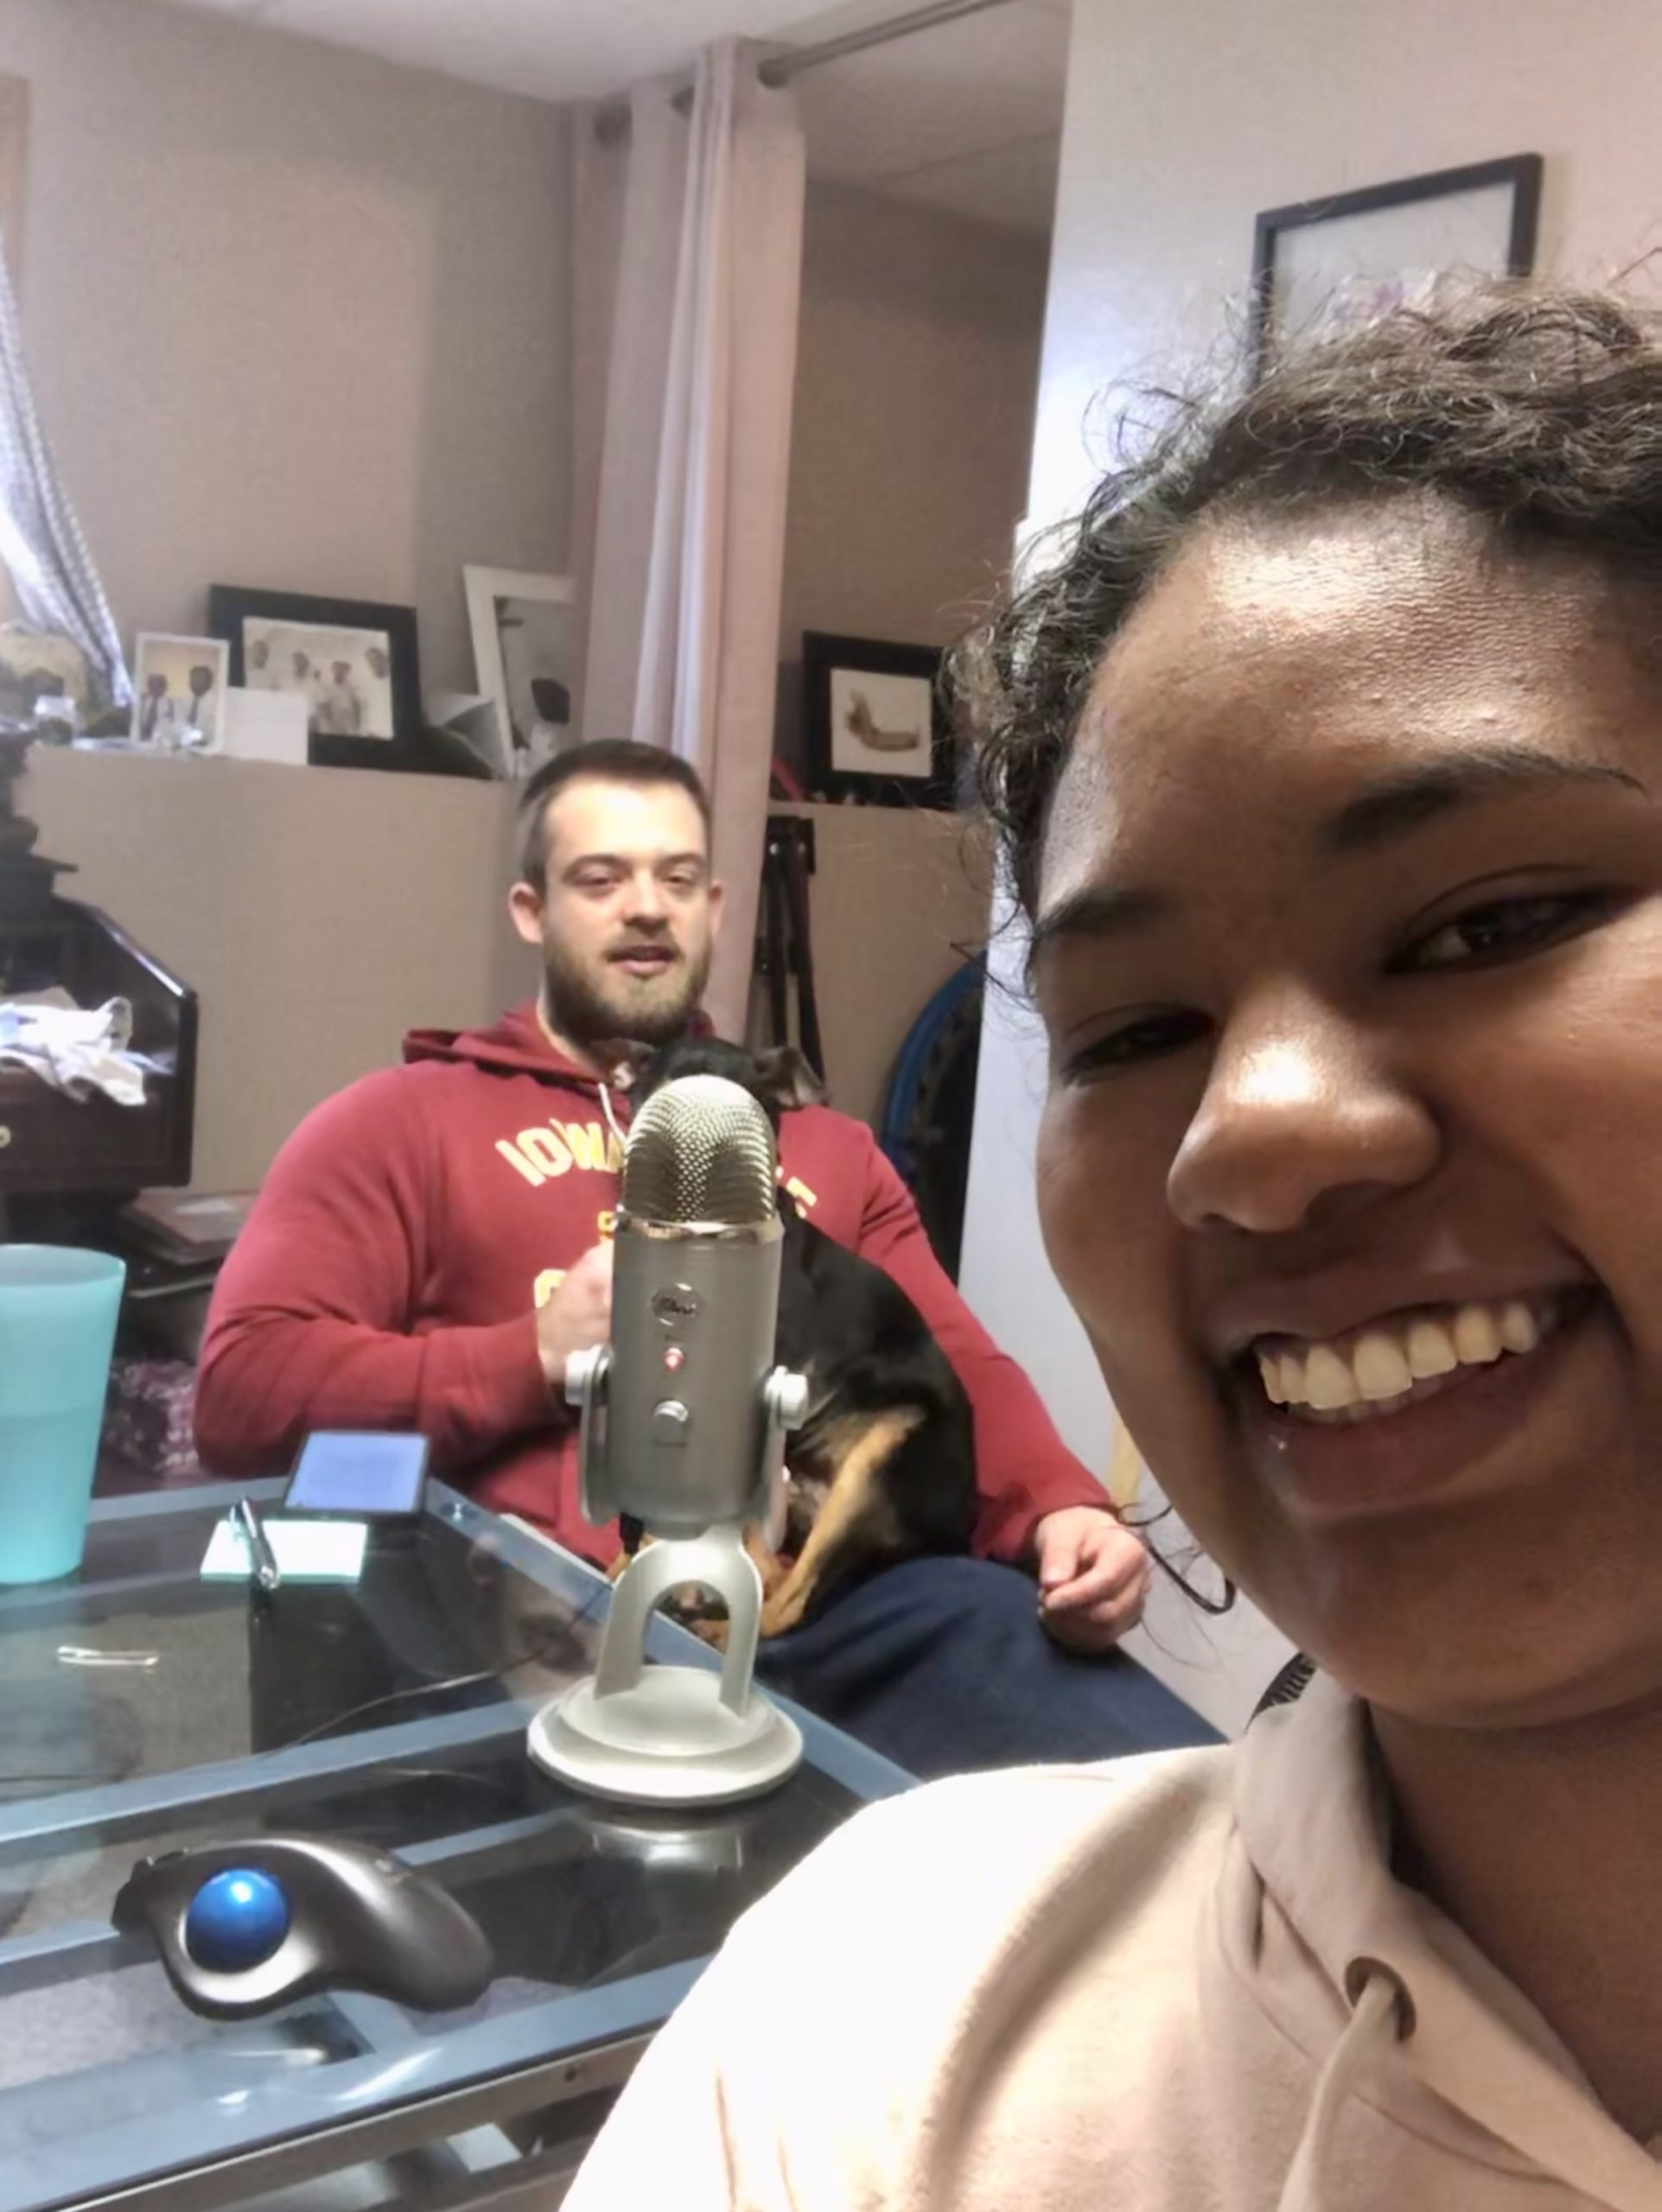 Recording Ep. 1 of The BioStudio Podcast